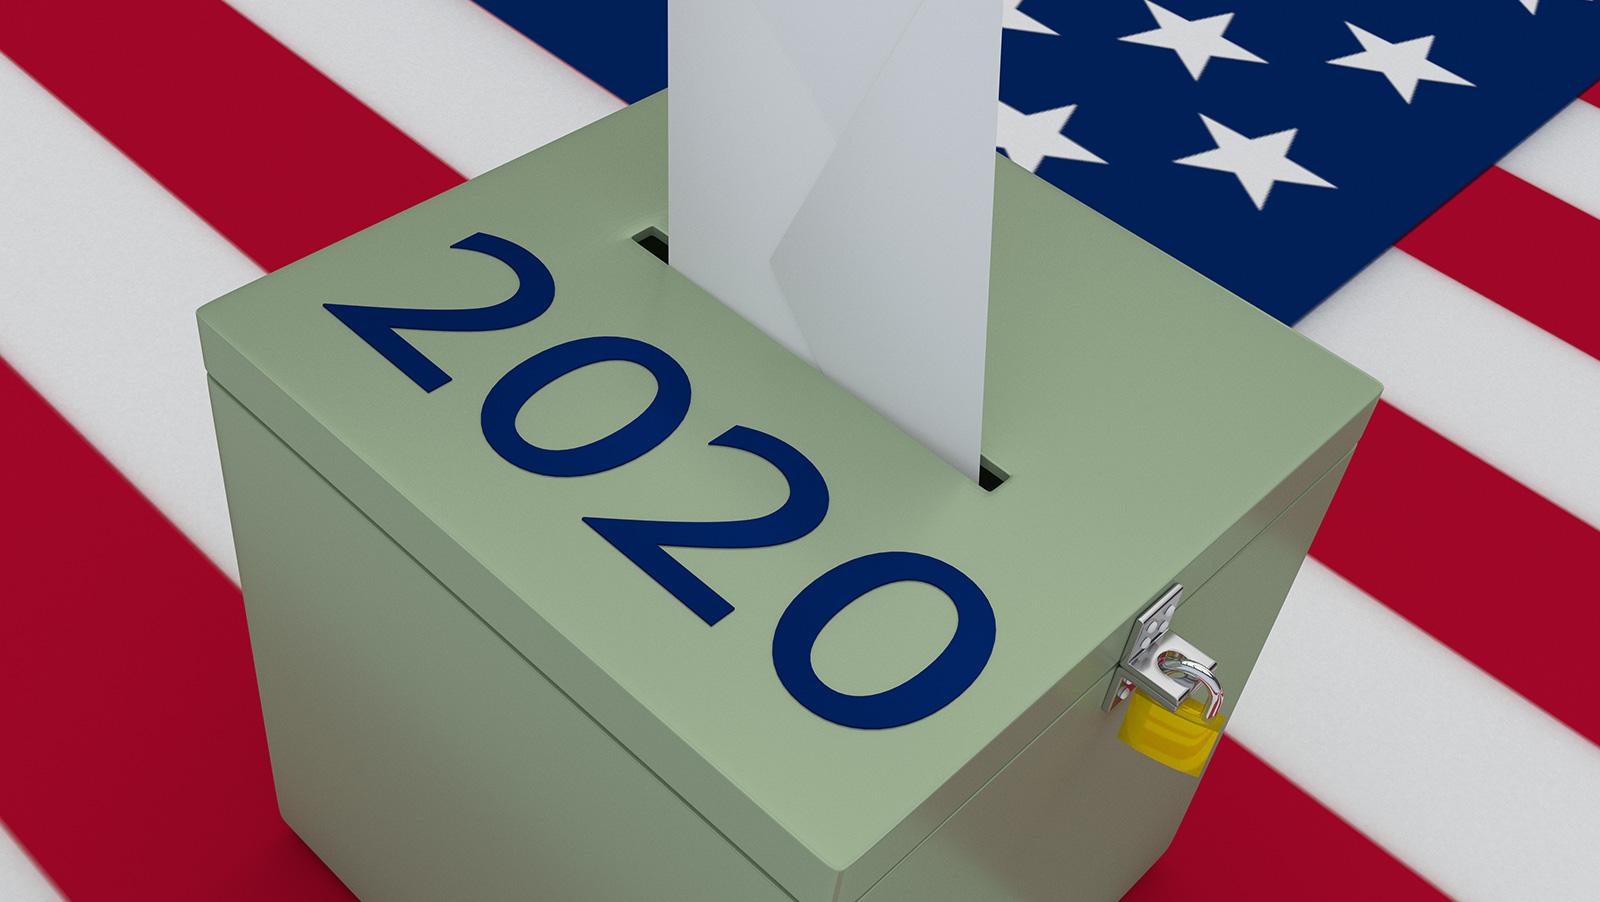 Updated US Presidential odds after Democratic debate